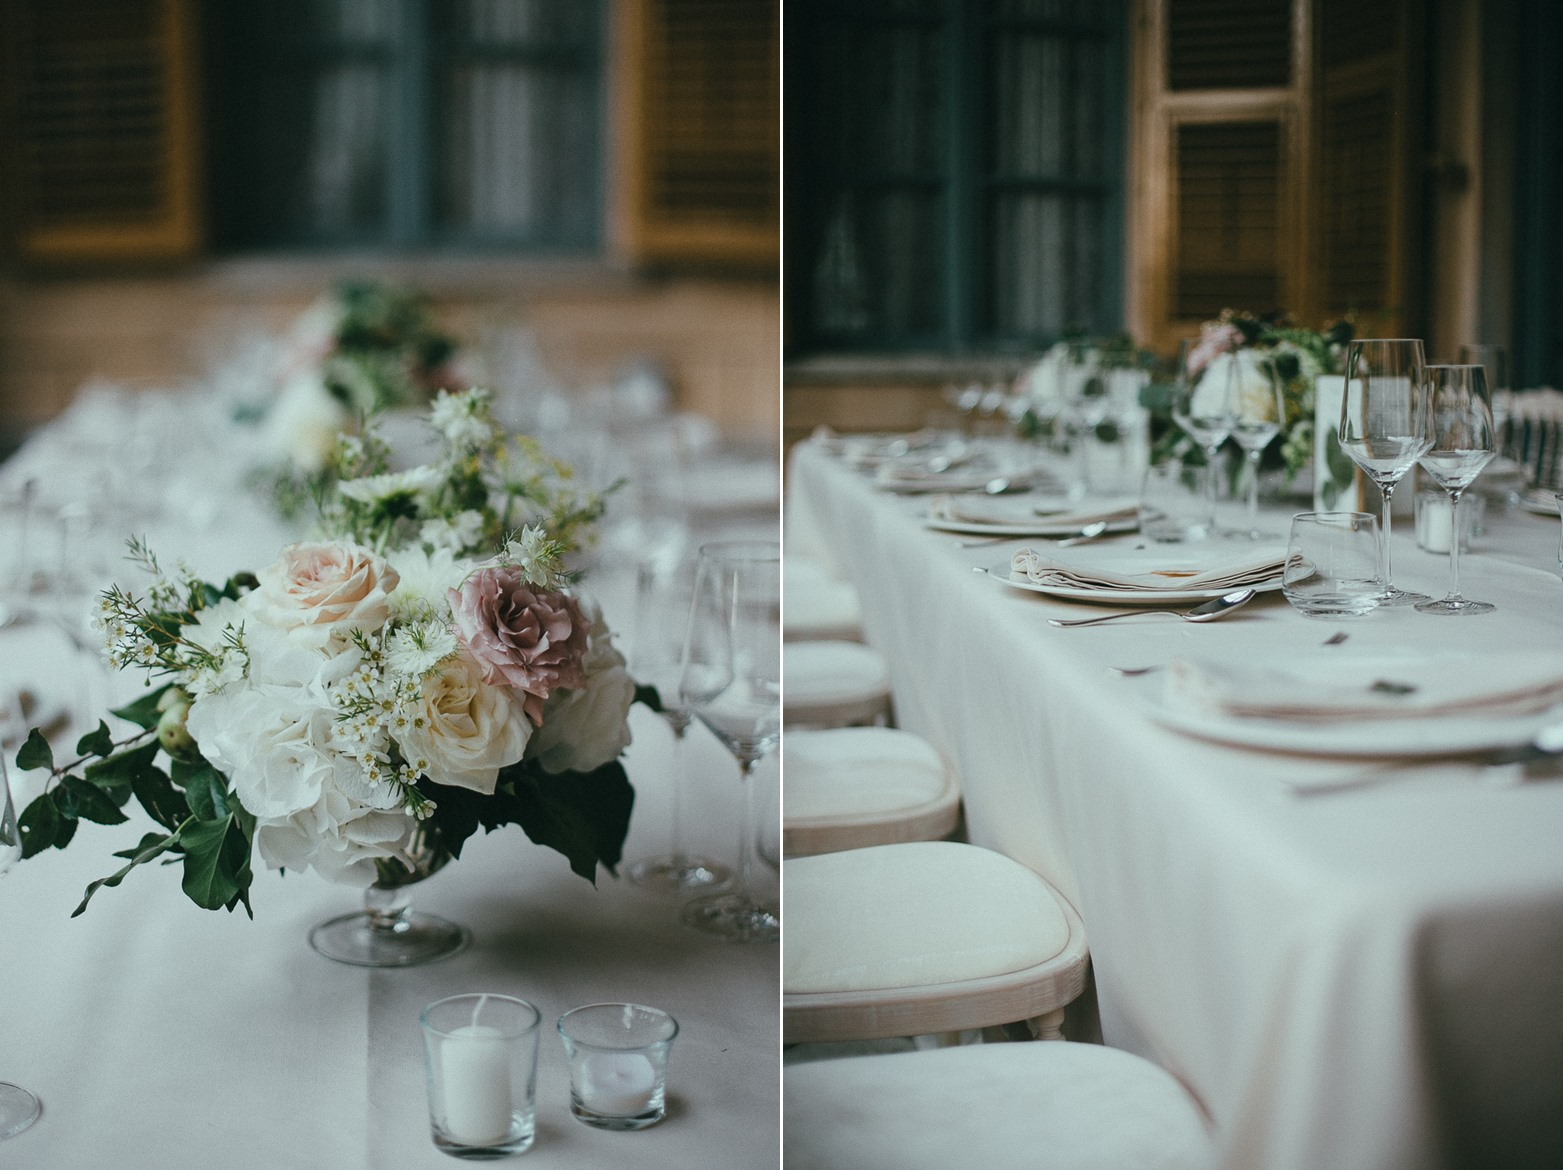 86-flowers-table-decor.jpg